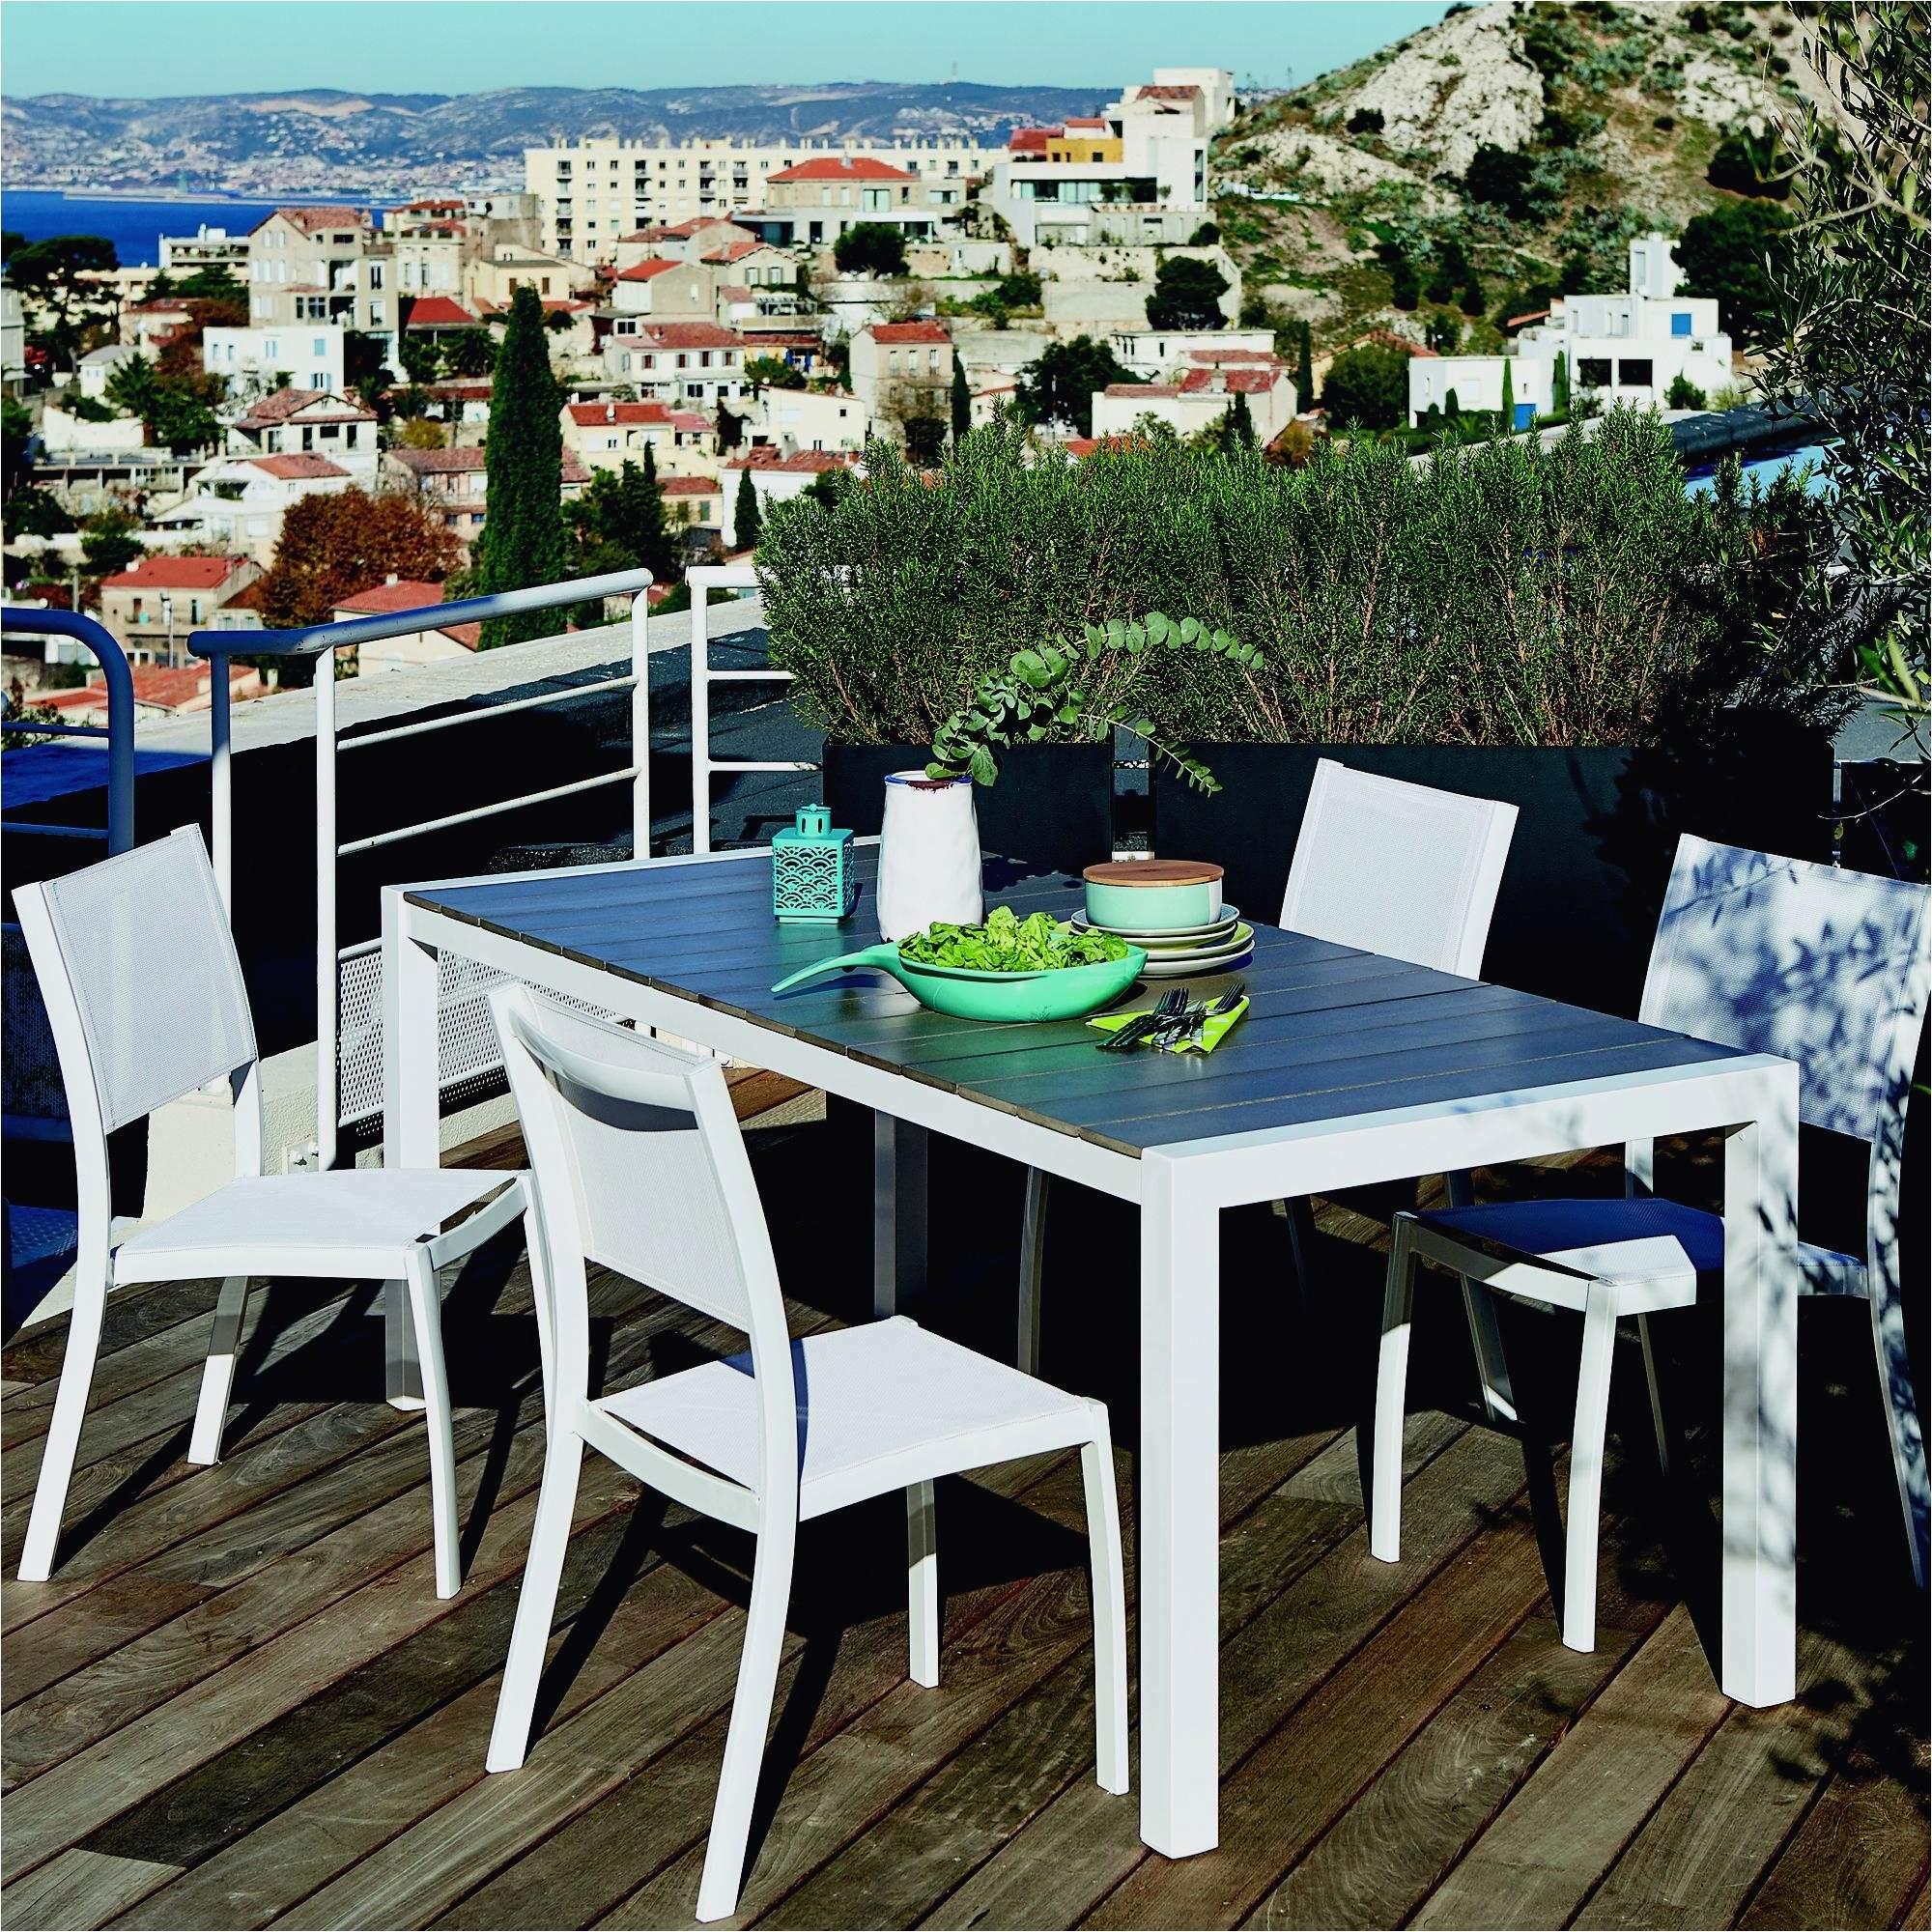 Balancelle Pas Cher Gifi Nouveau Image Table De Jardin Gifi Moderne Balancelle Jardin Pas Cher Ainsi Que